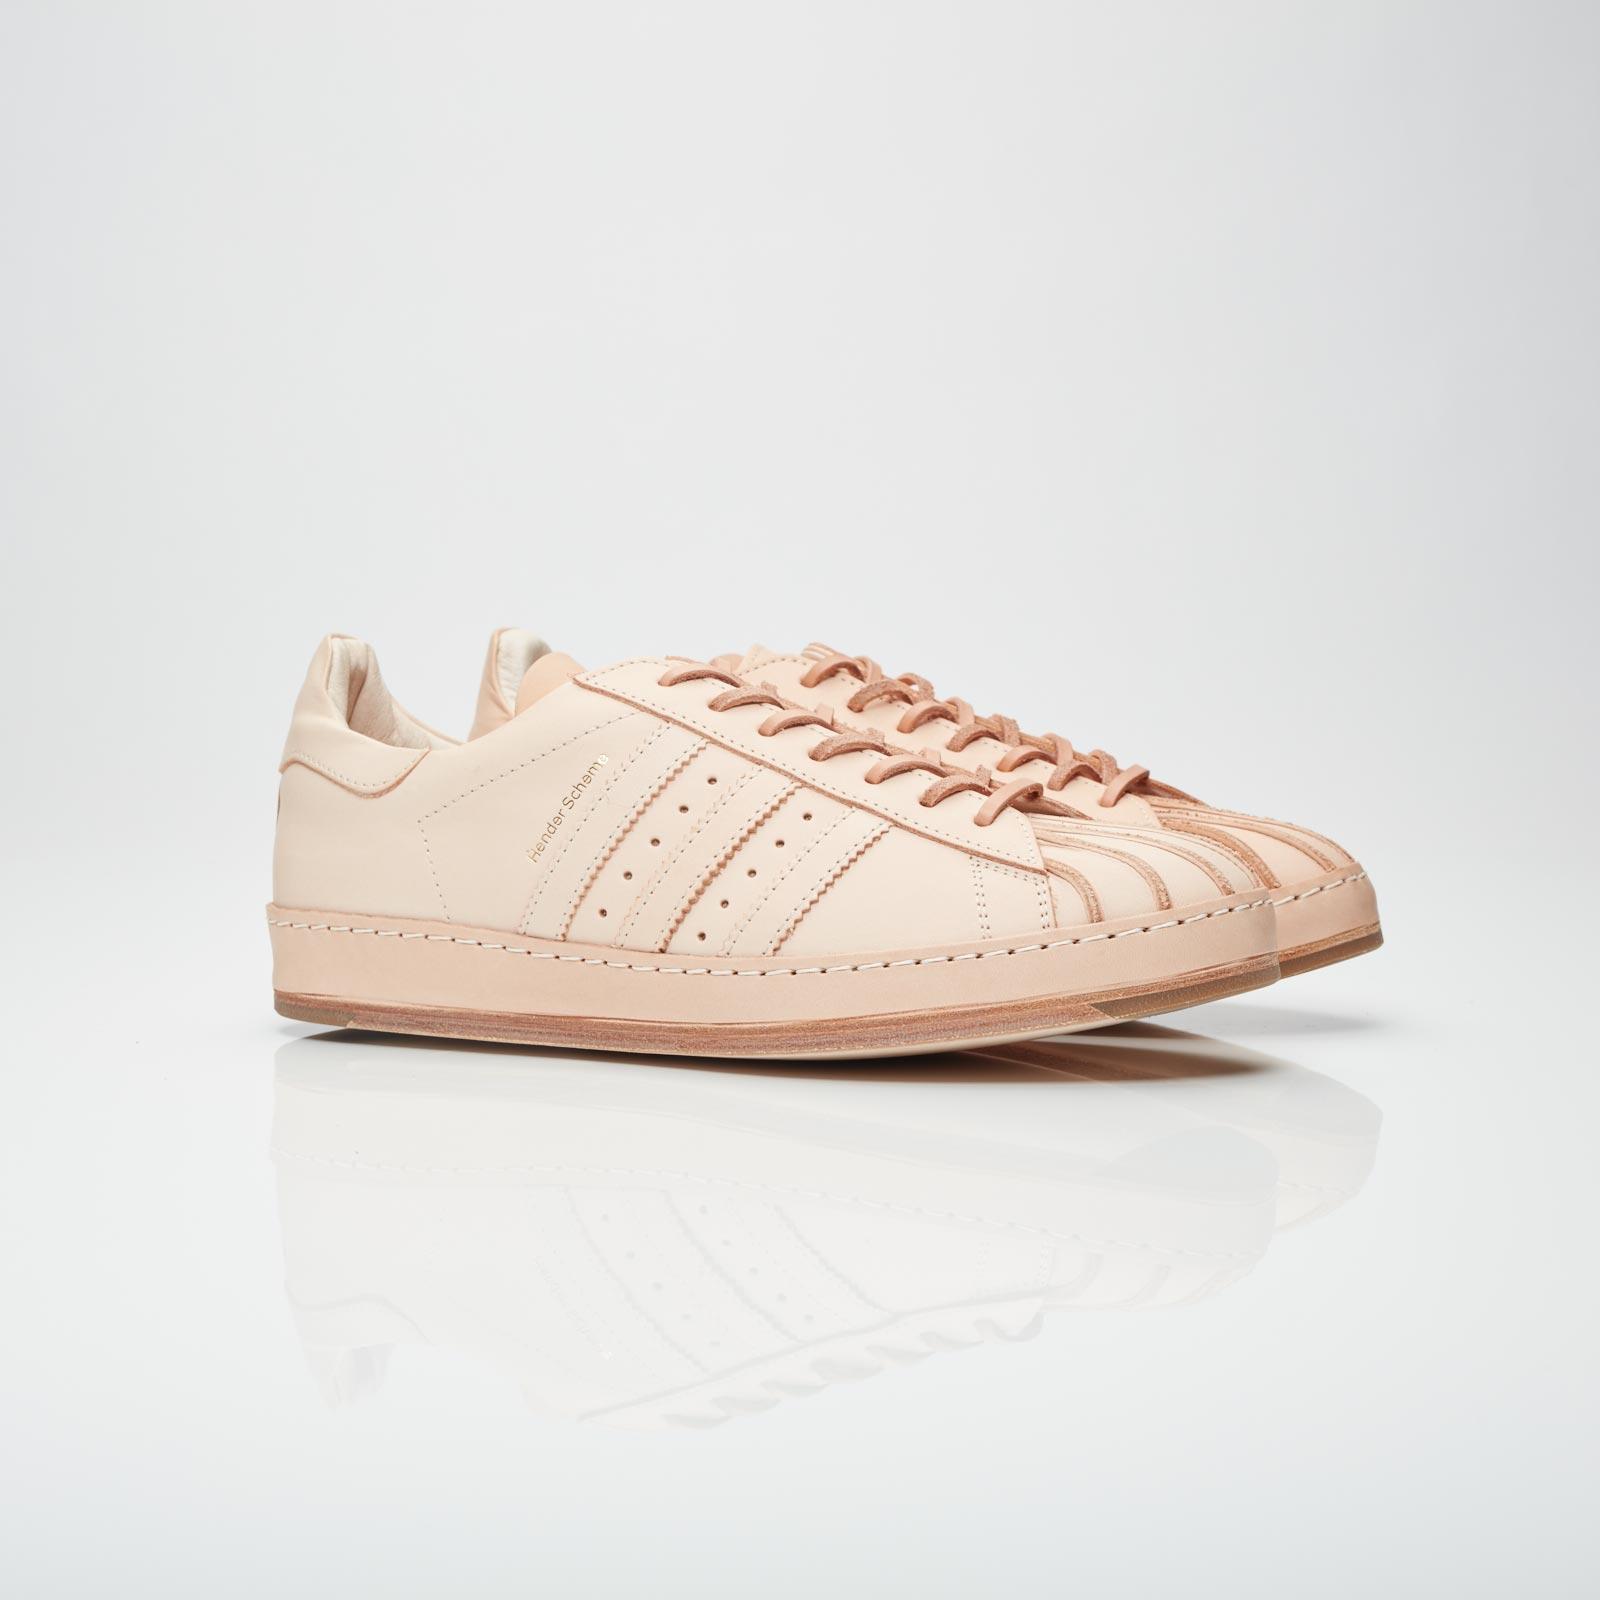 277961195573e adidas Superstar Hender Scheme - Ci9812 - Sneakersnstuff